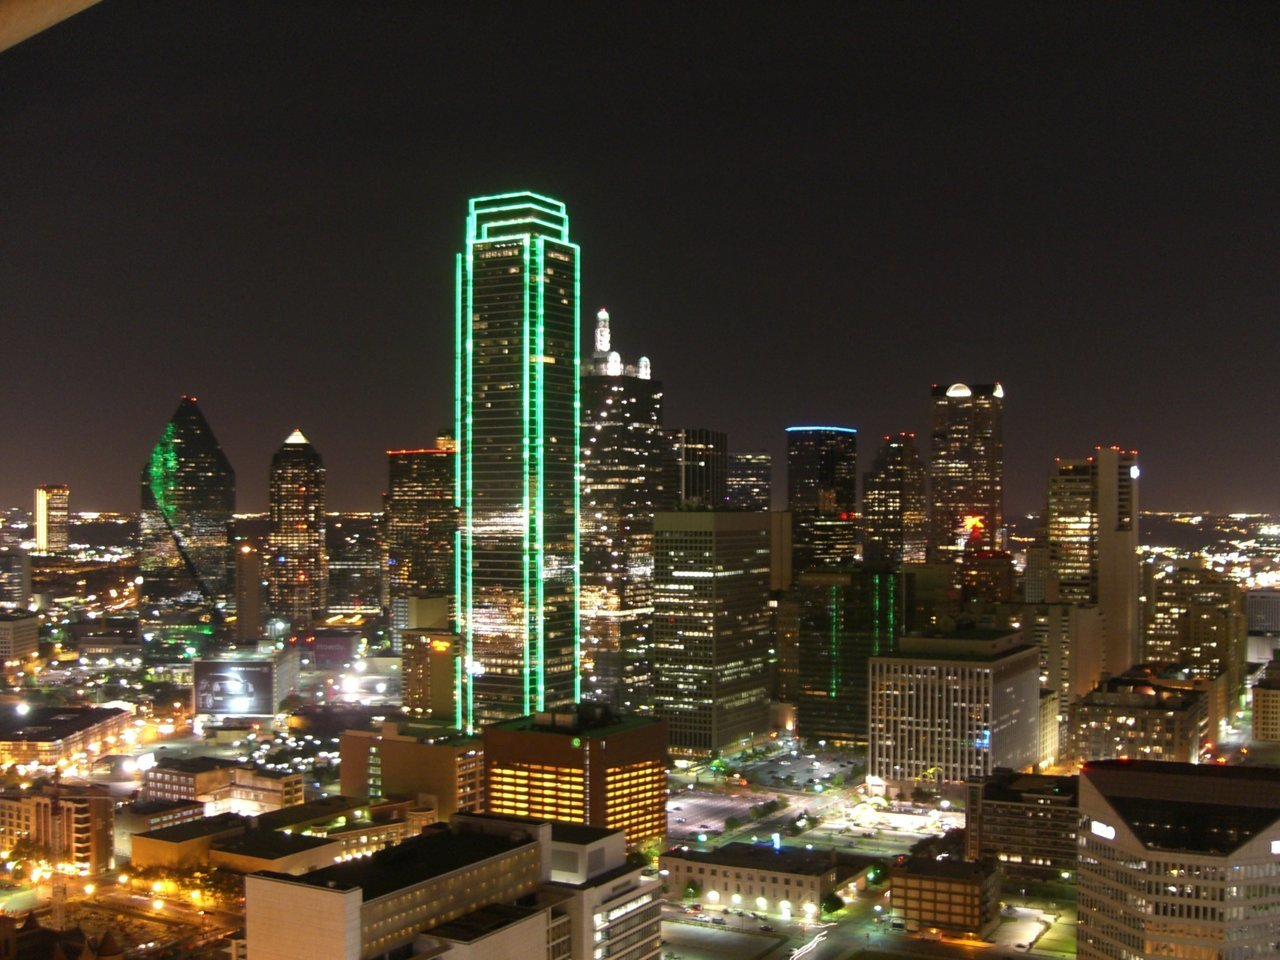 Dallas_Texas_Skyline_bei_Nacht.jpg